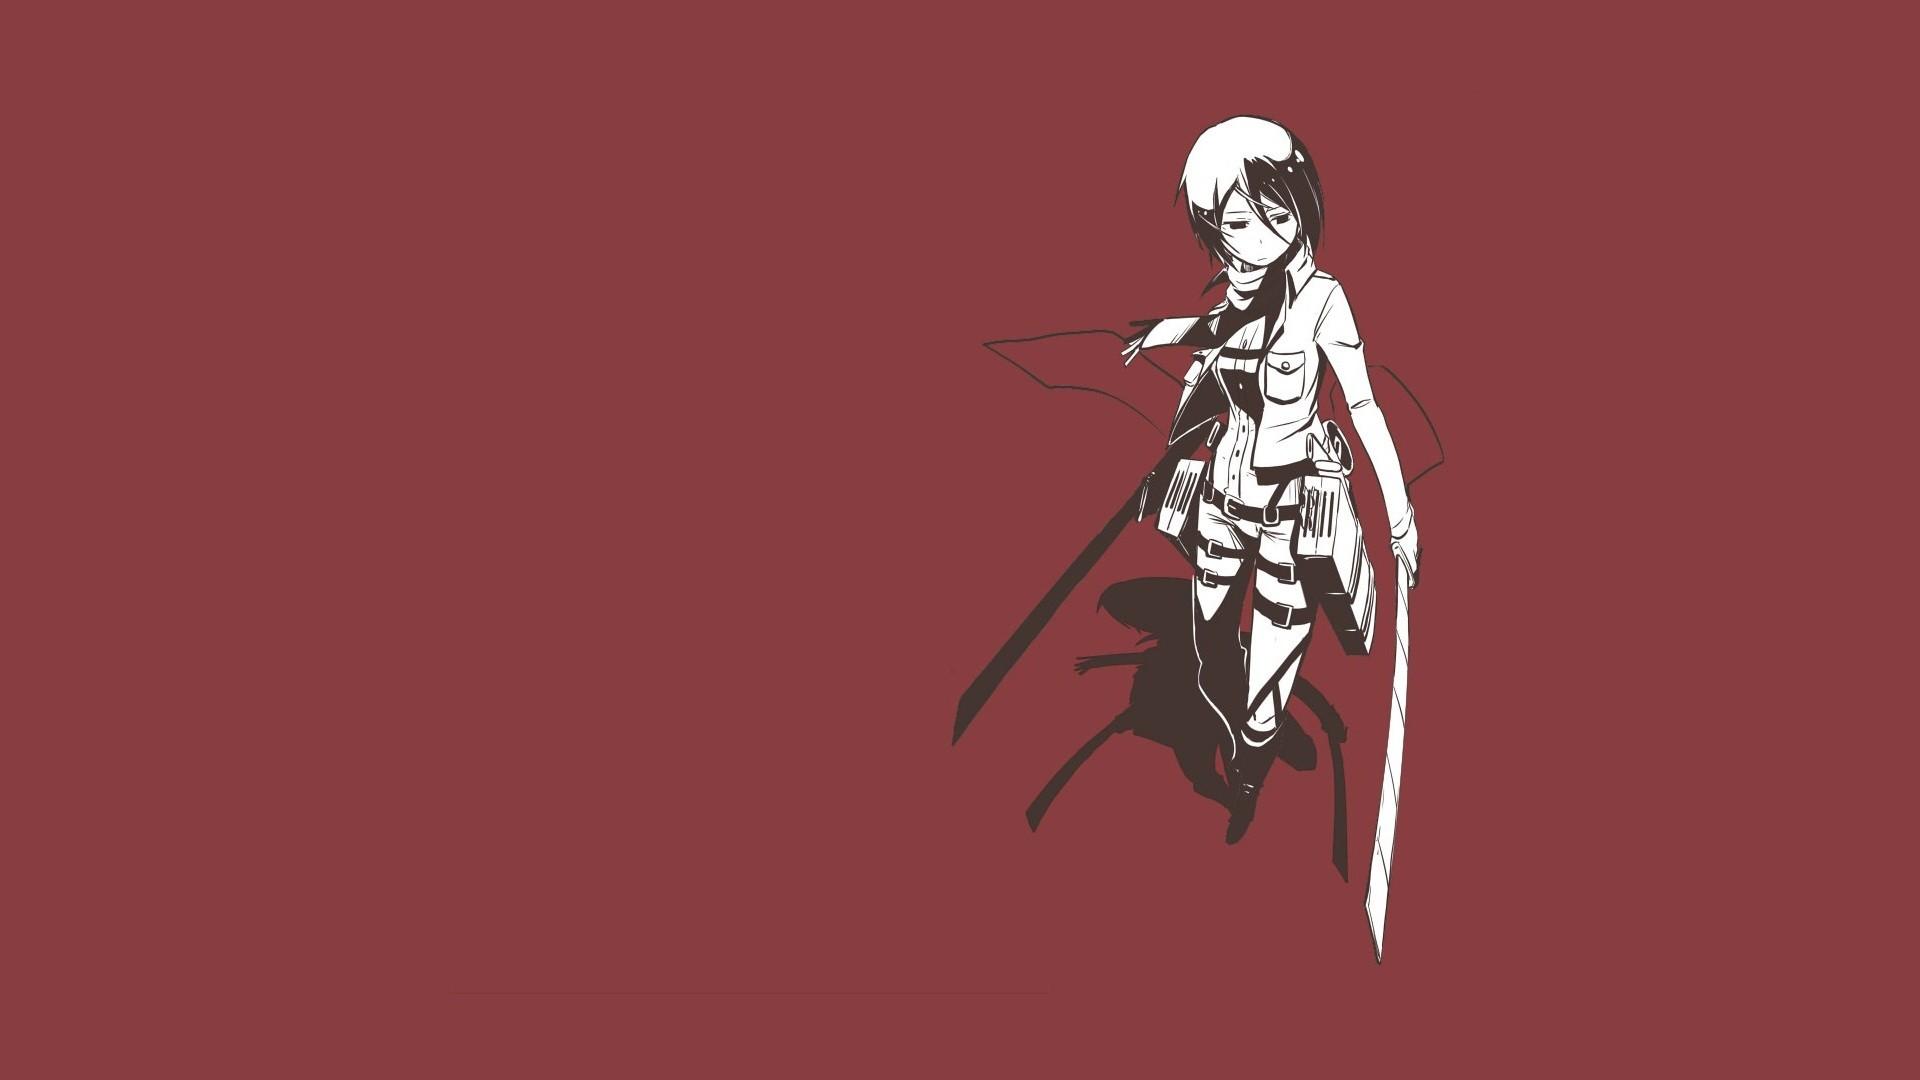 Shingeki No Kyojin Mikasa Ackerman Red Simple Background Minimalism Simple Wallpaper Resolution 1920x1080 Id 645226 Wallha Com